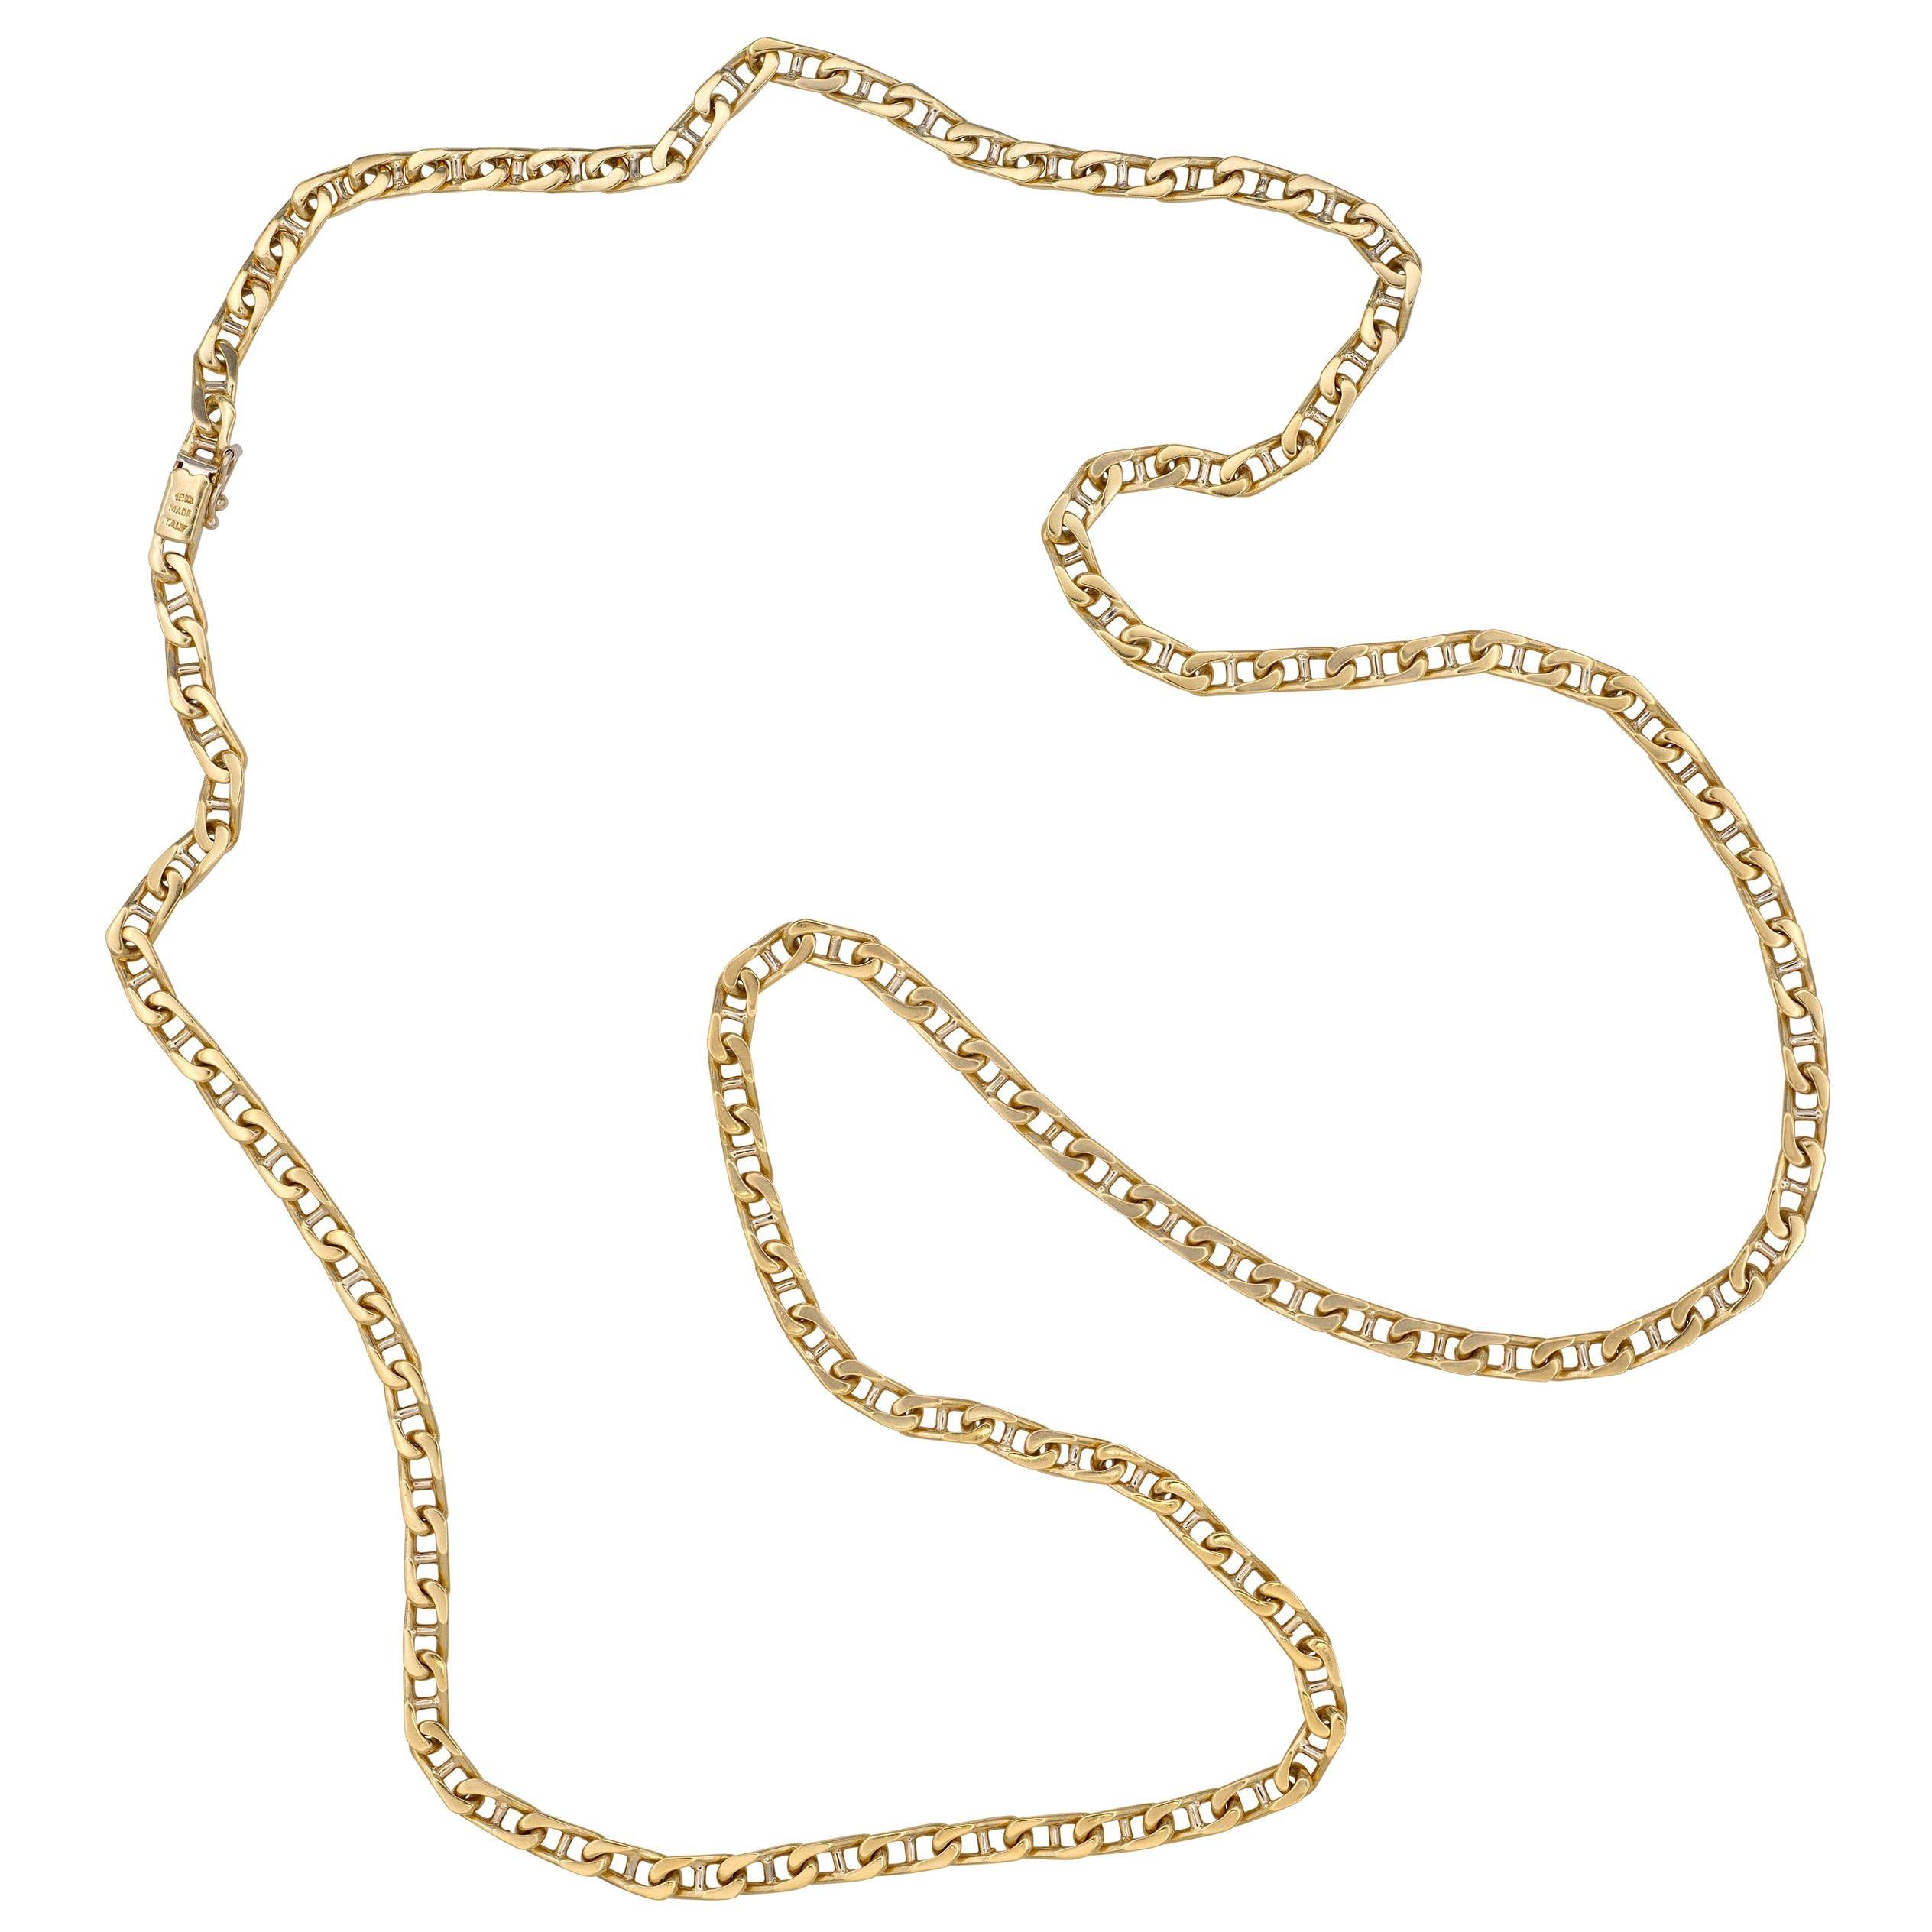 1980s Long Bulgari Gold Mariner's Link Chain